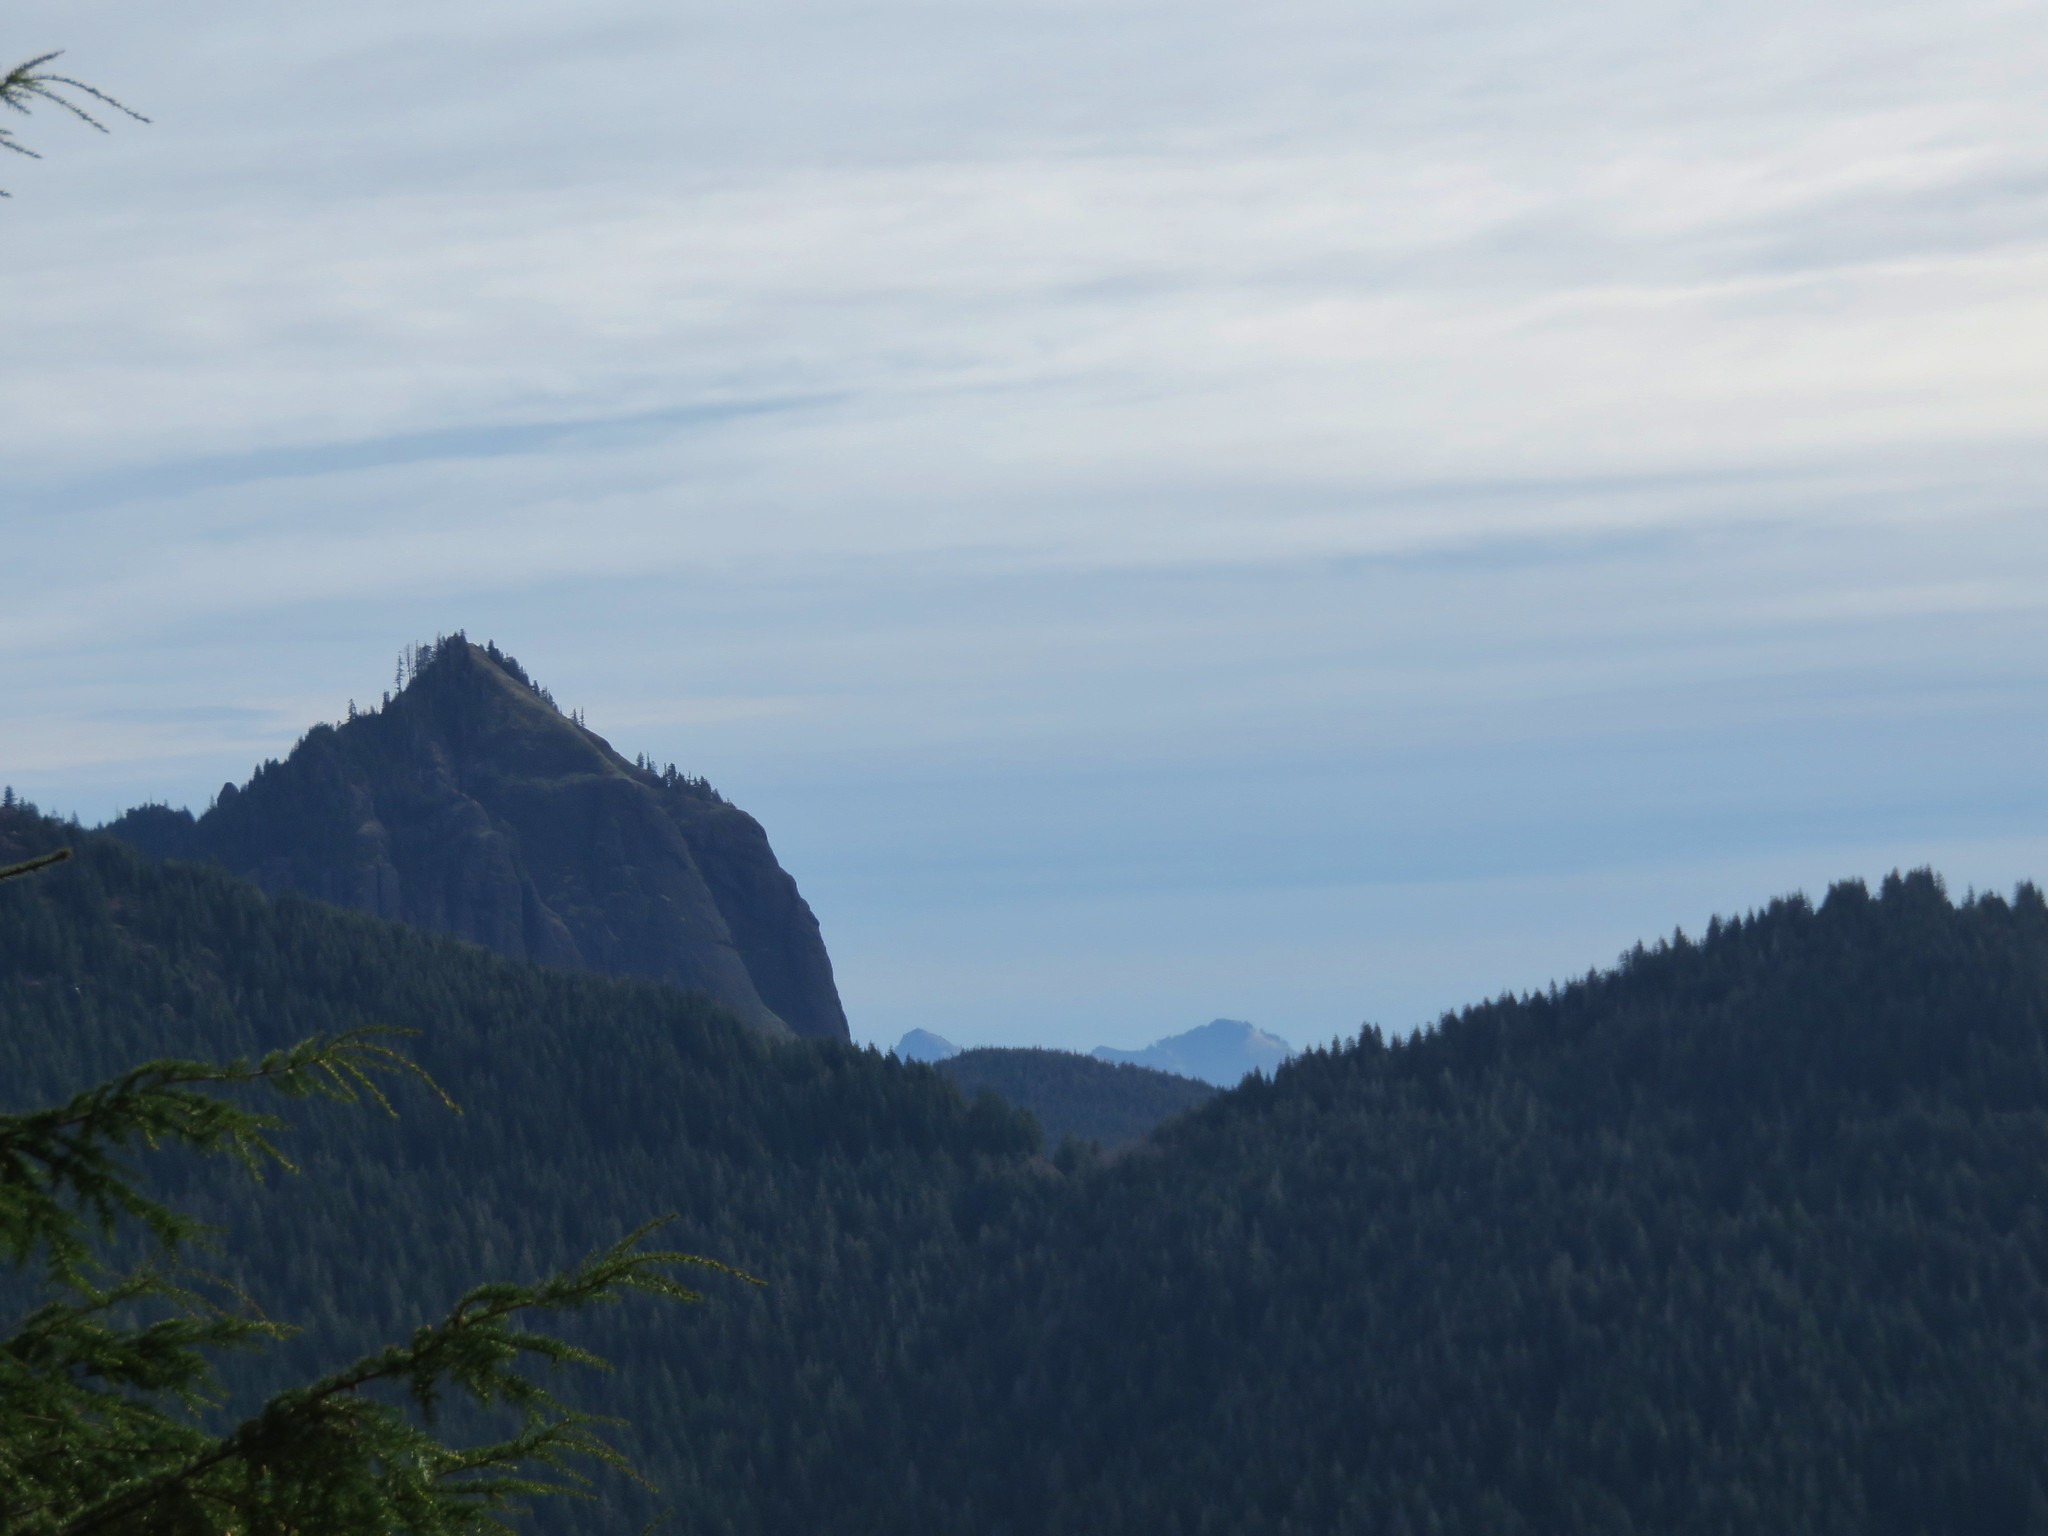 Onion Peak and Saddle Mountain